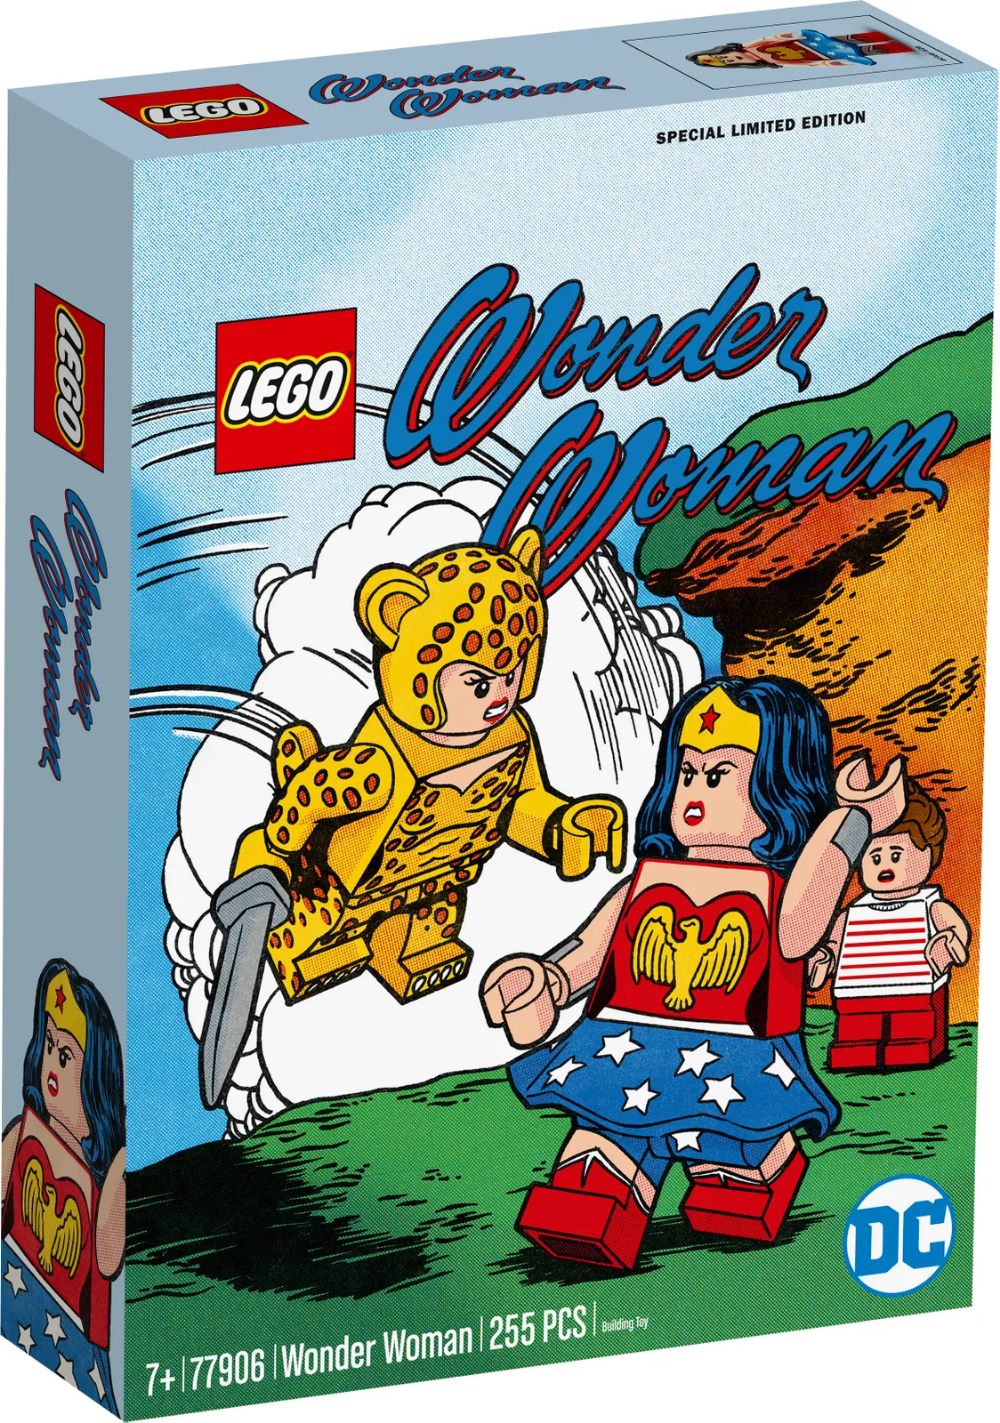 Wonder Woman 77906 Dc Buy Online At The Official Lego Shop Us In 2020 Lego Sets Wonder Lego